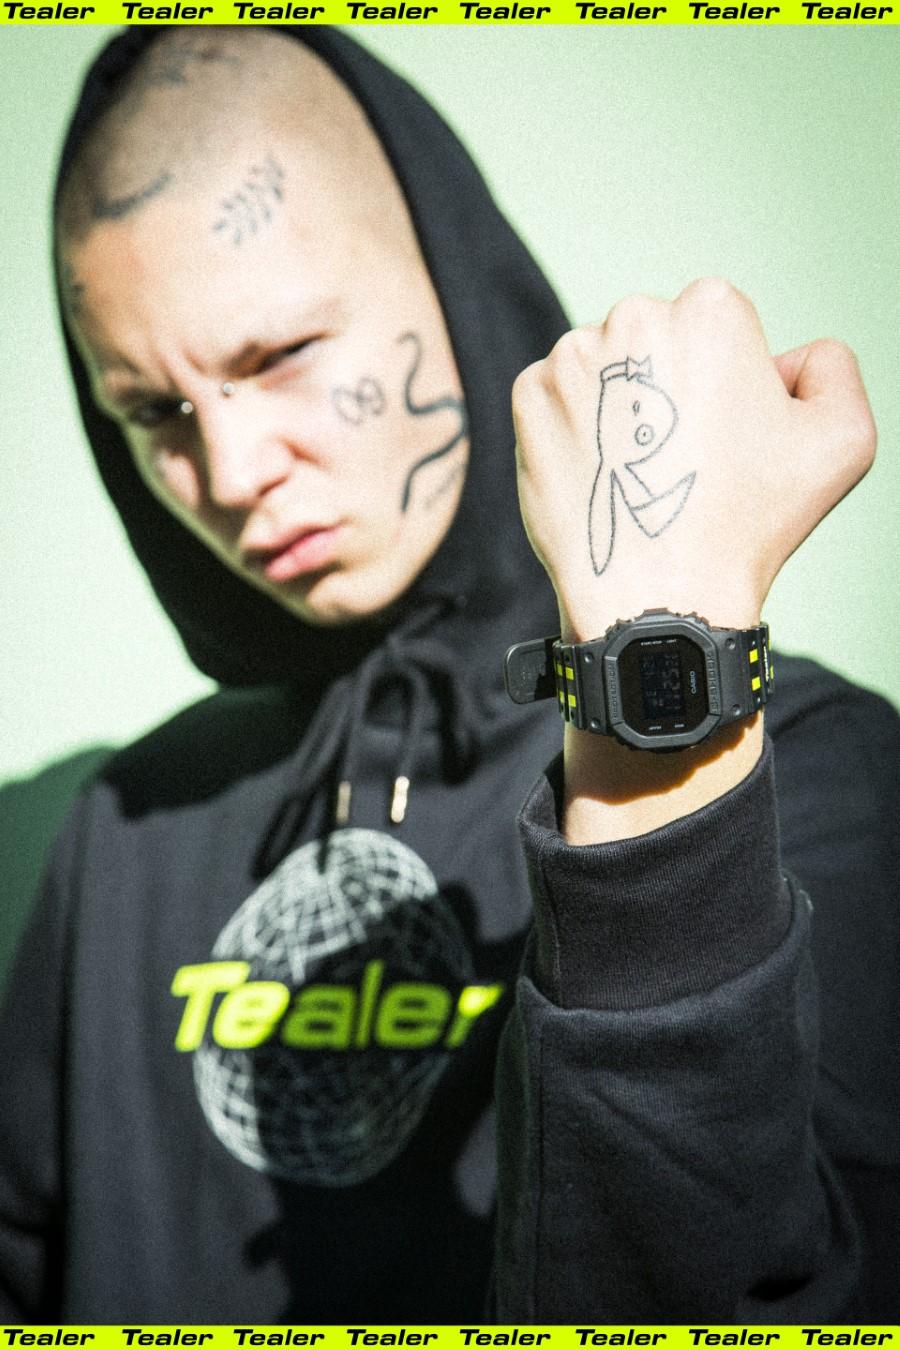 G-Shock x Tealer 420 Malware